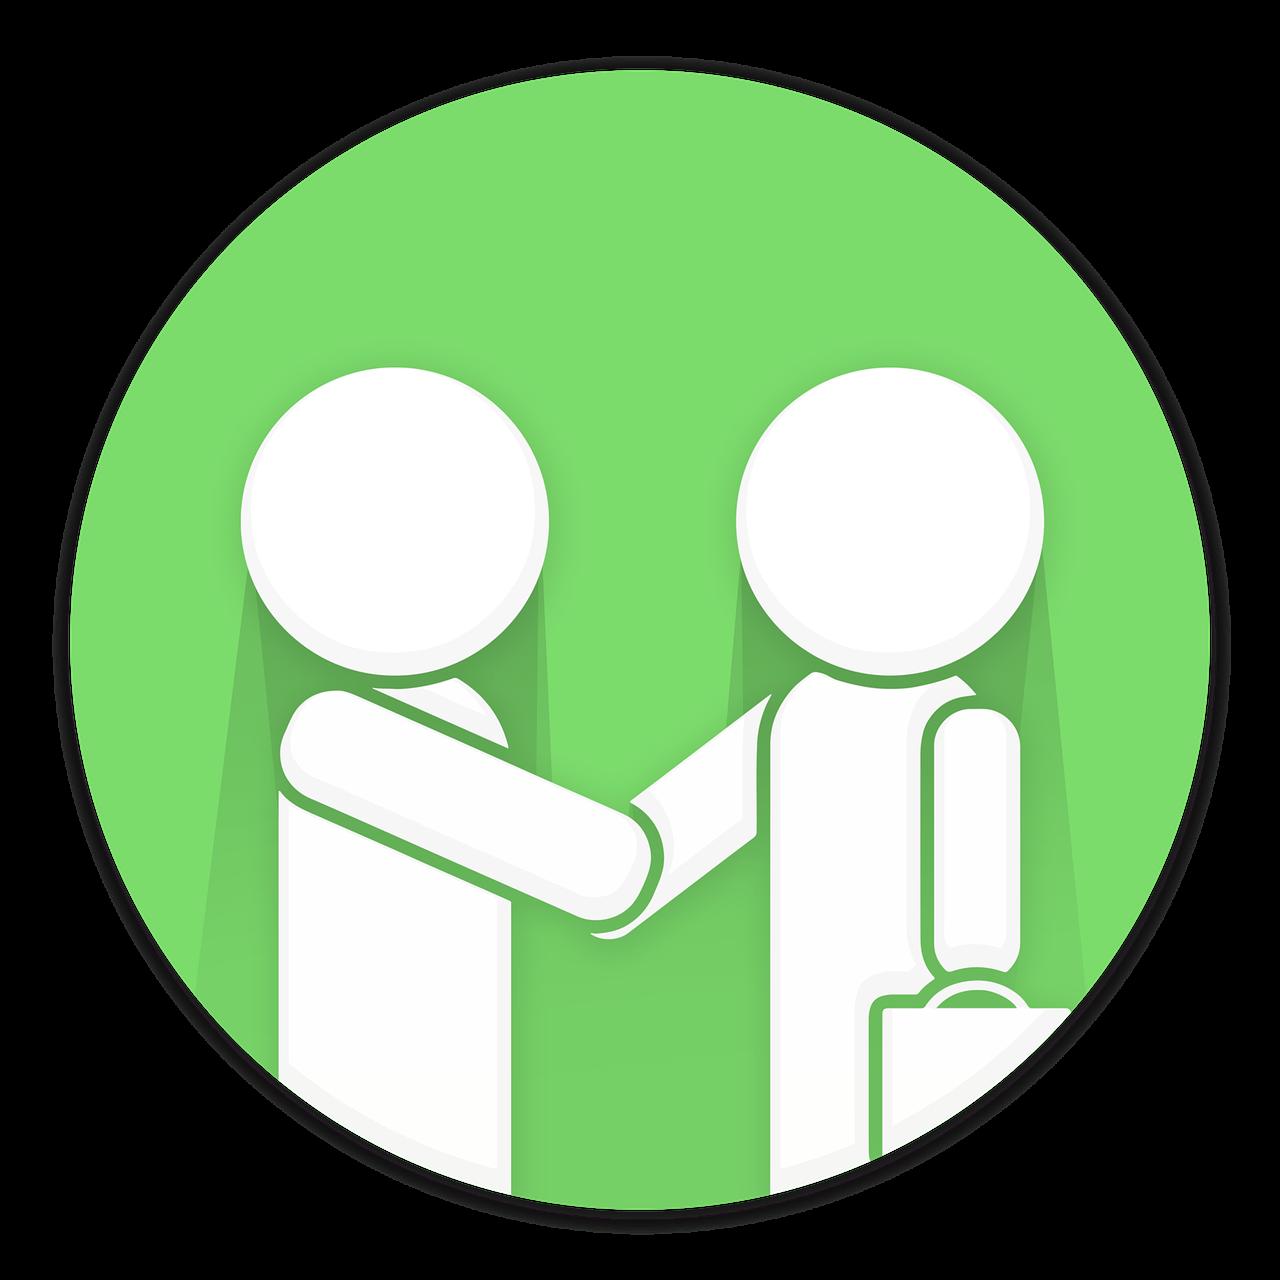 customer service, customer satisfaction, shaking hands